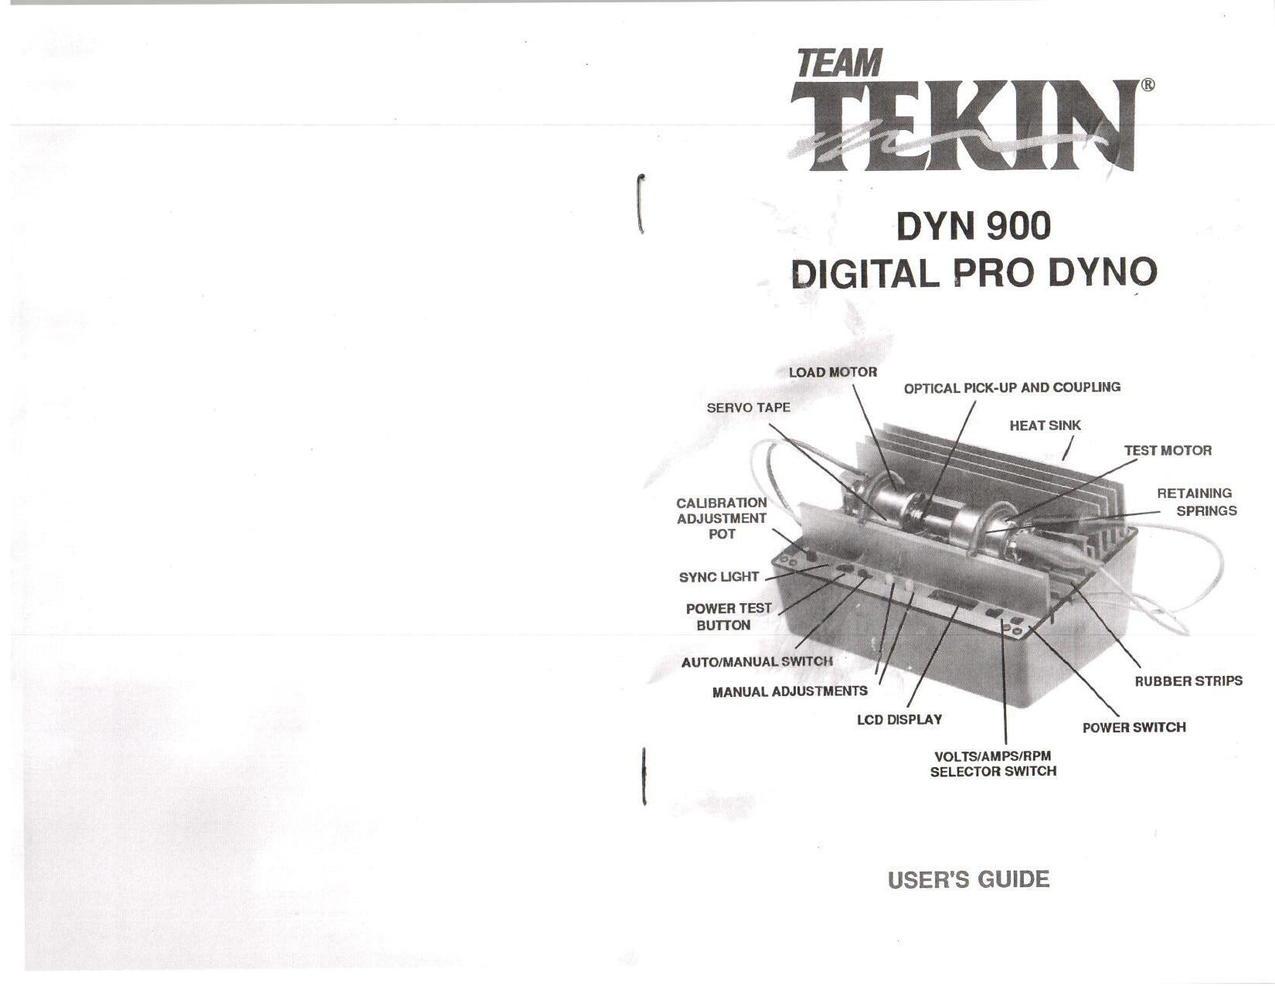 Tekin Dyn 900 Manual Tekin Dyno - R/C Tech Forums